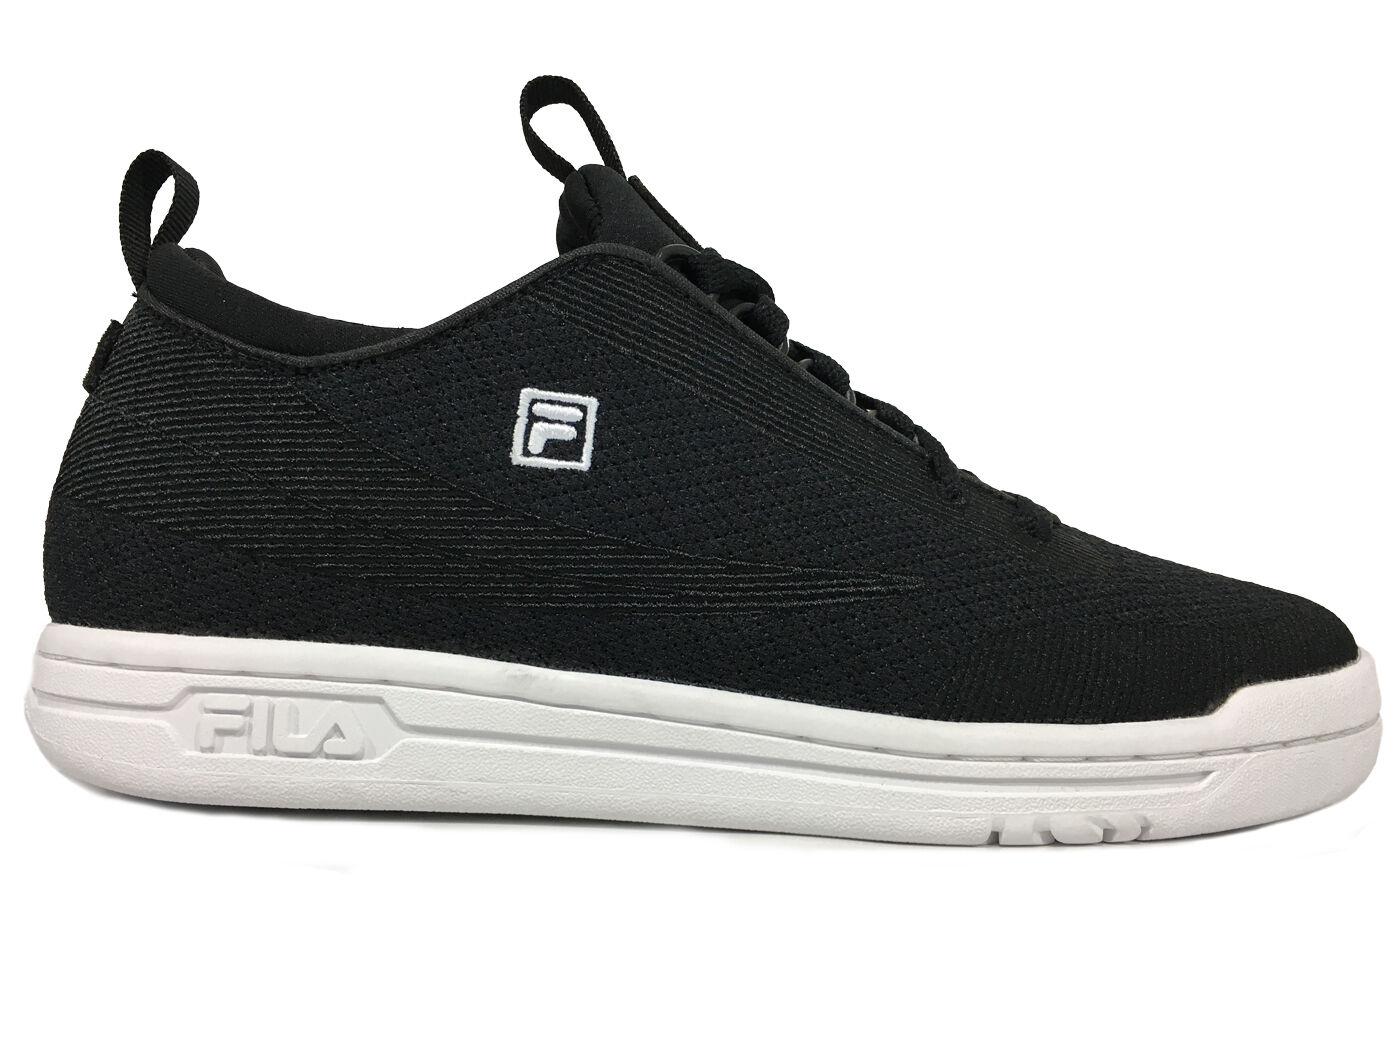 Fila Original SW 2.0 Tennis Sneaker shoes in Black